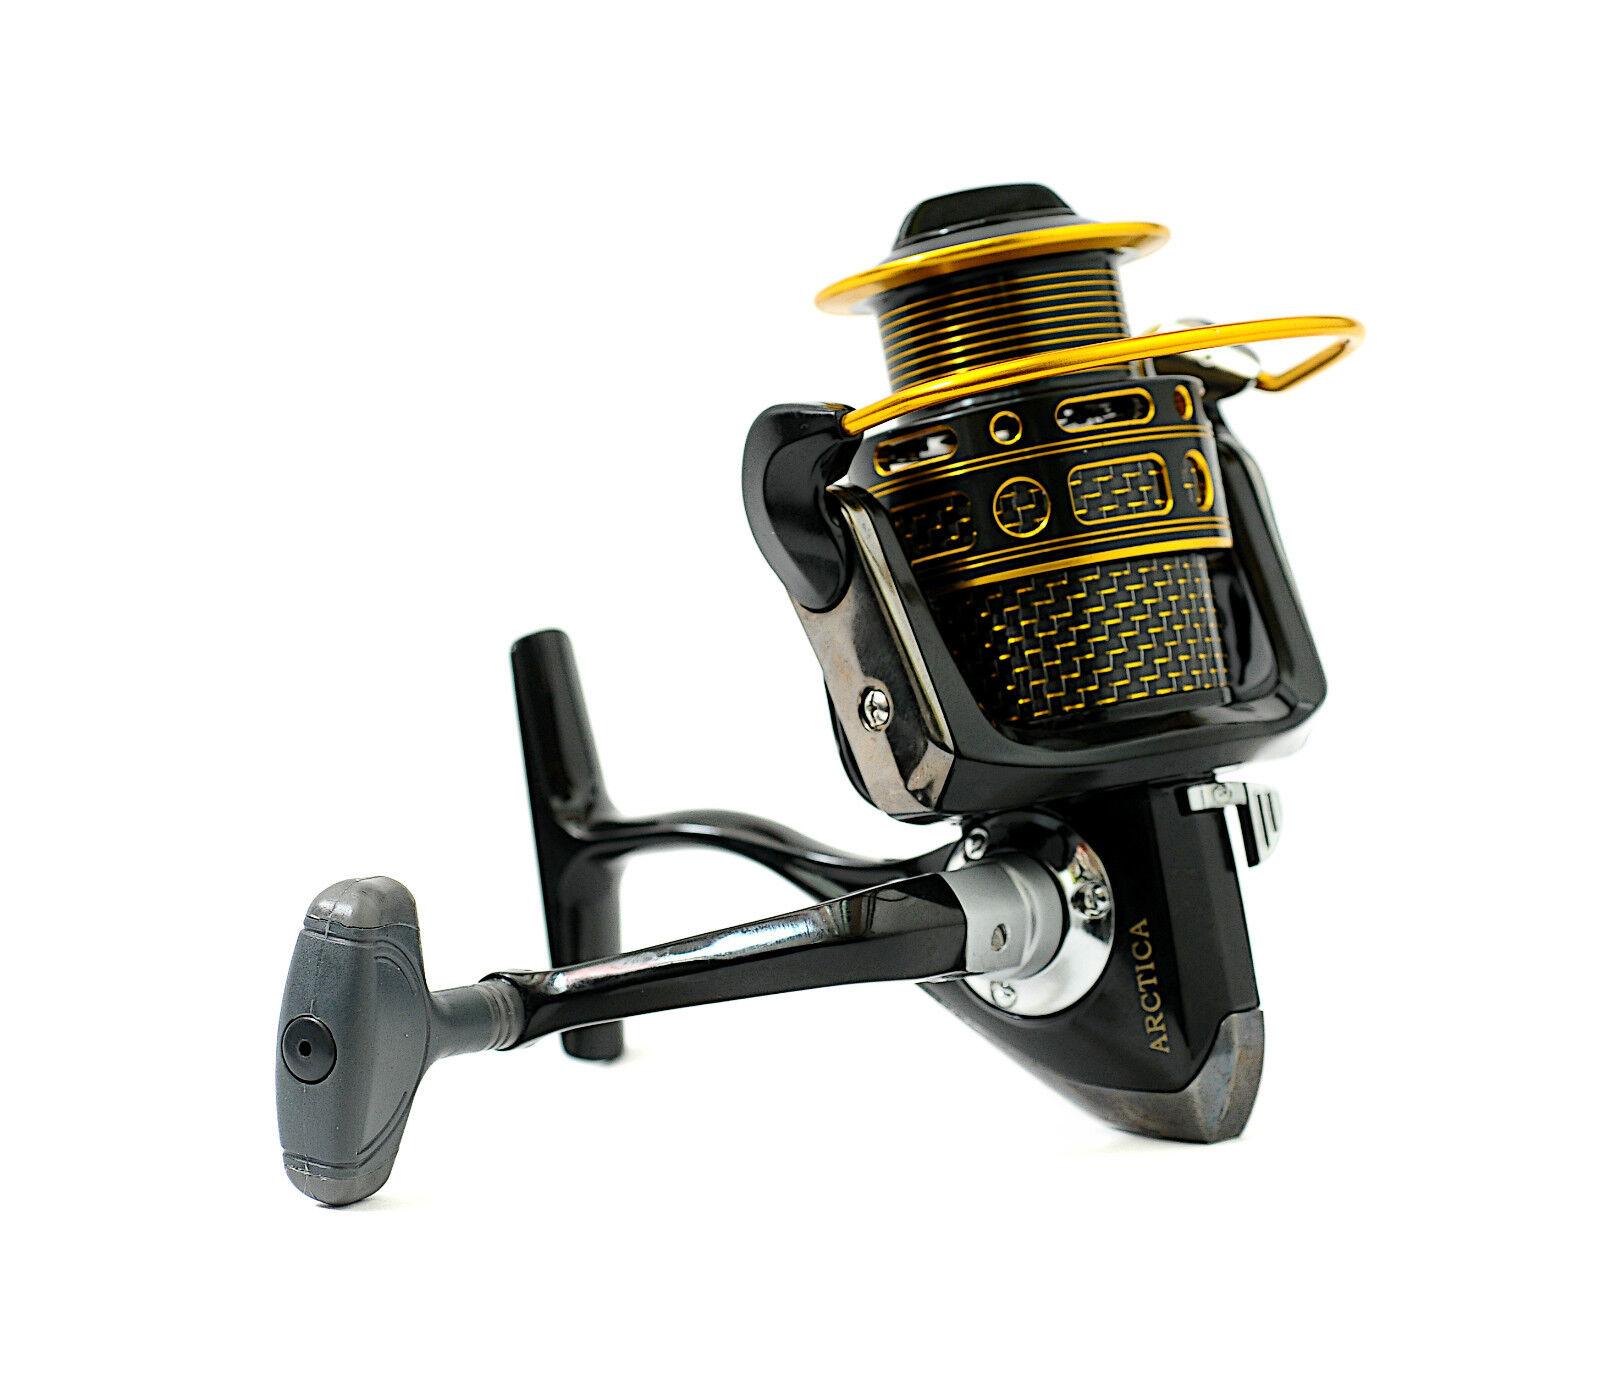 Ryobi arctica 3000 spinning fishing reel rotor with carbon for Ryobi fishing reel